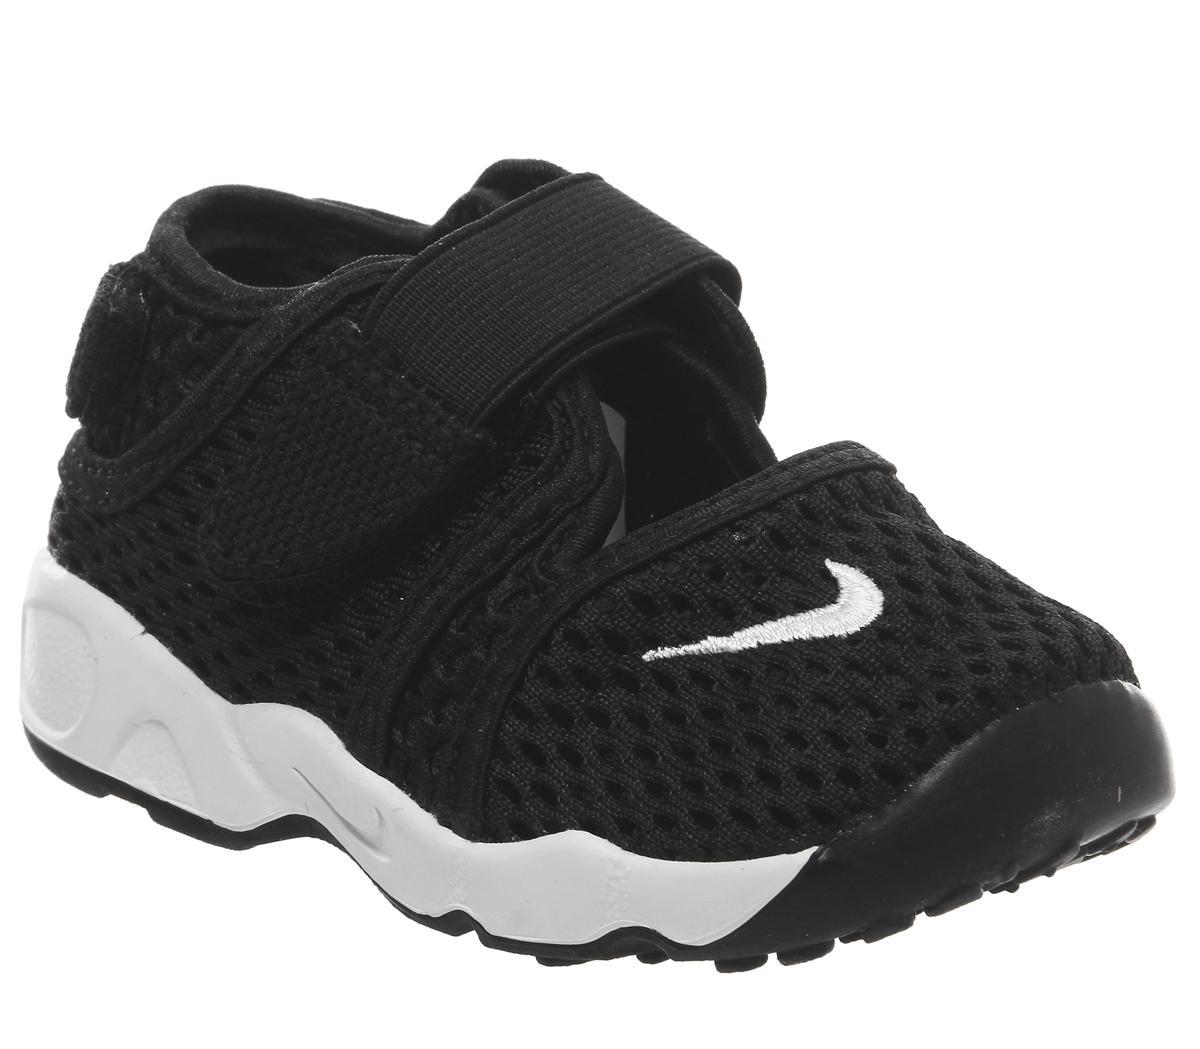 Nike Rift Infant Trainers Black White